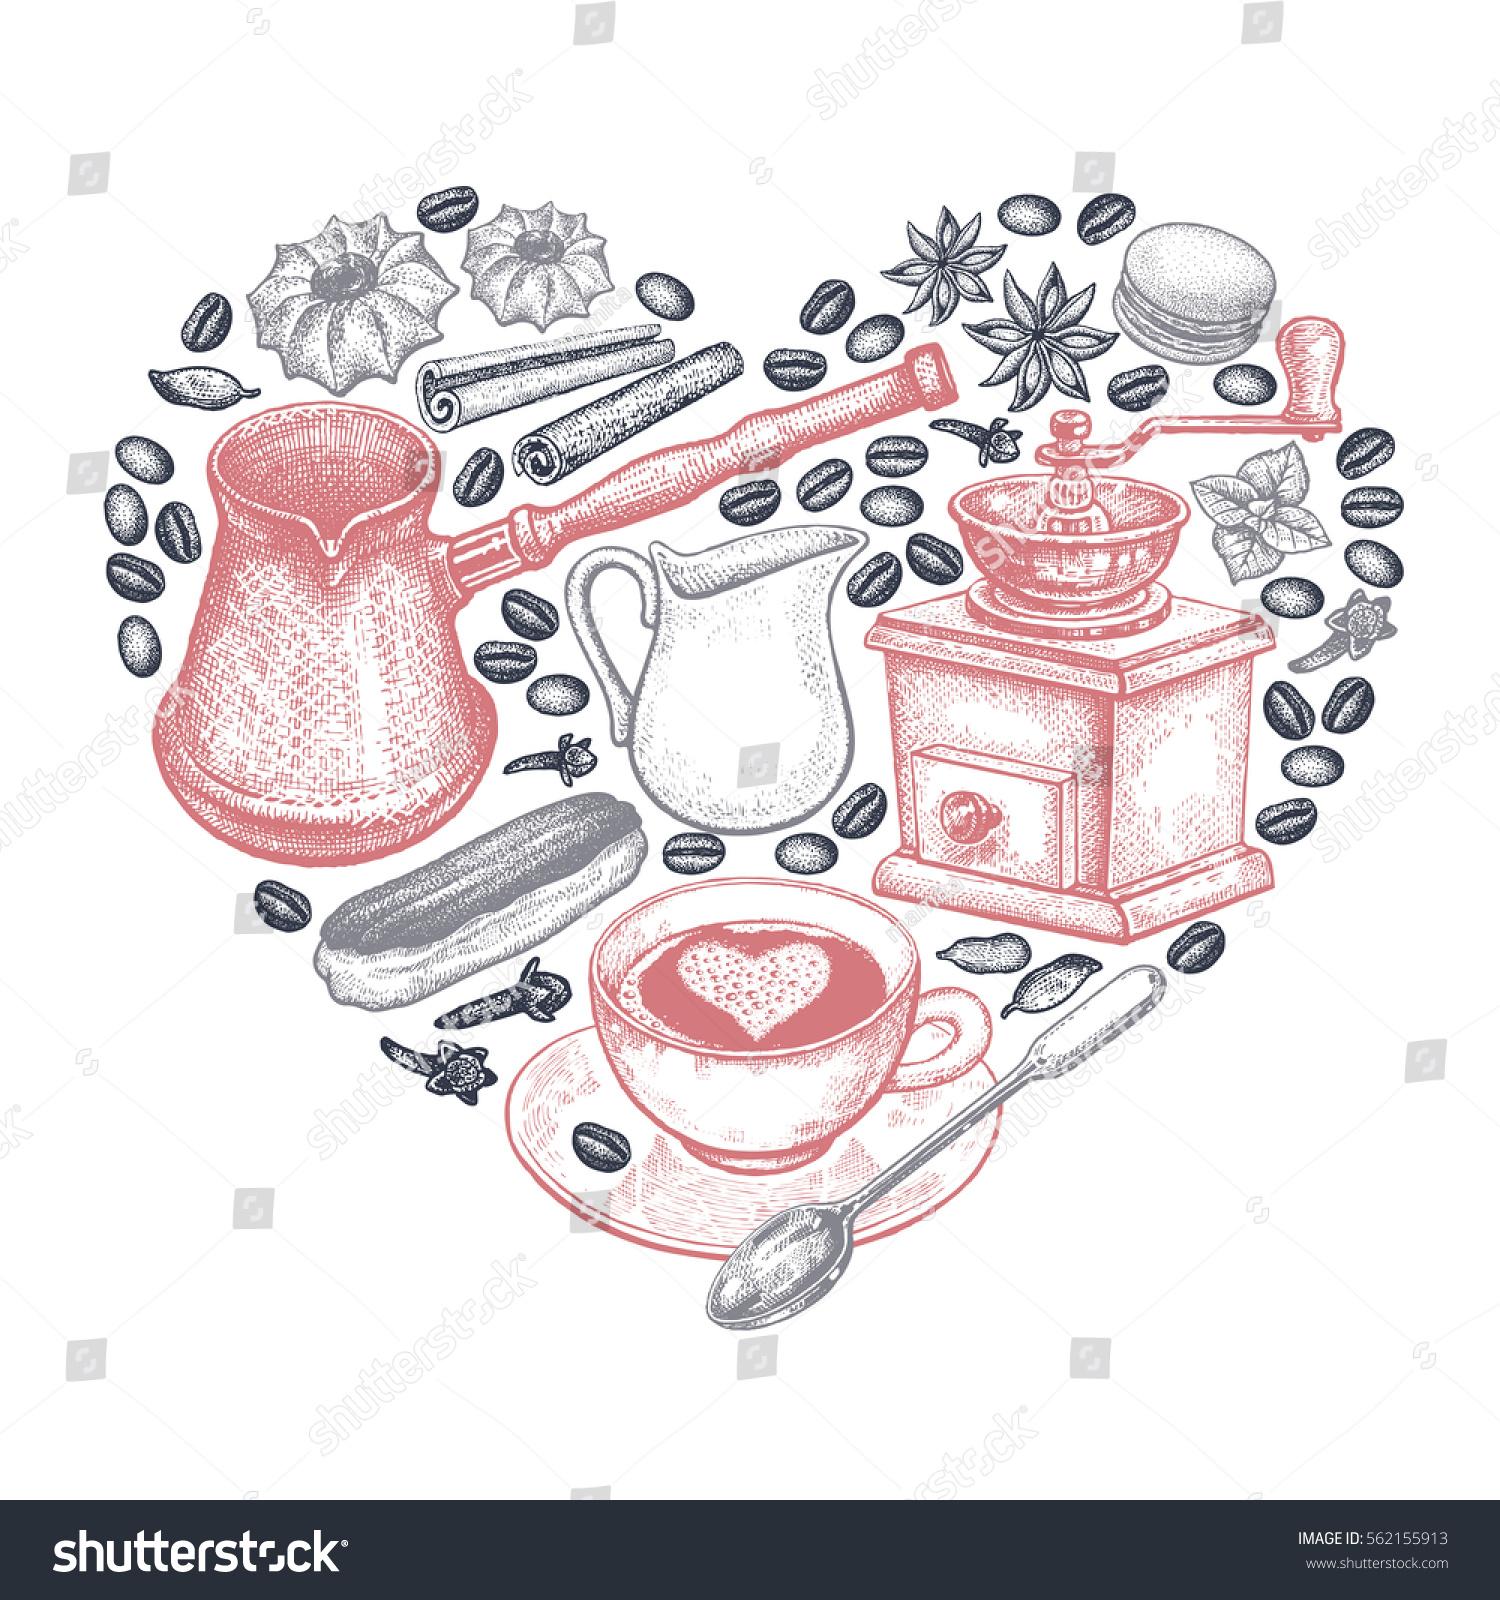 Coffee Heart Vector Illustration Art Set Stock Vector HD Royalty